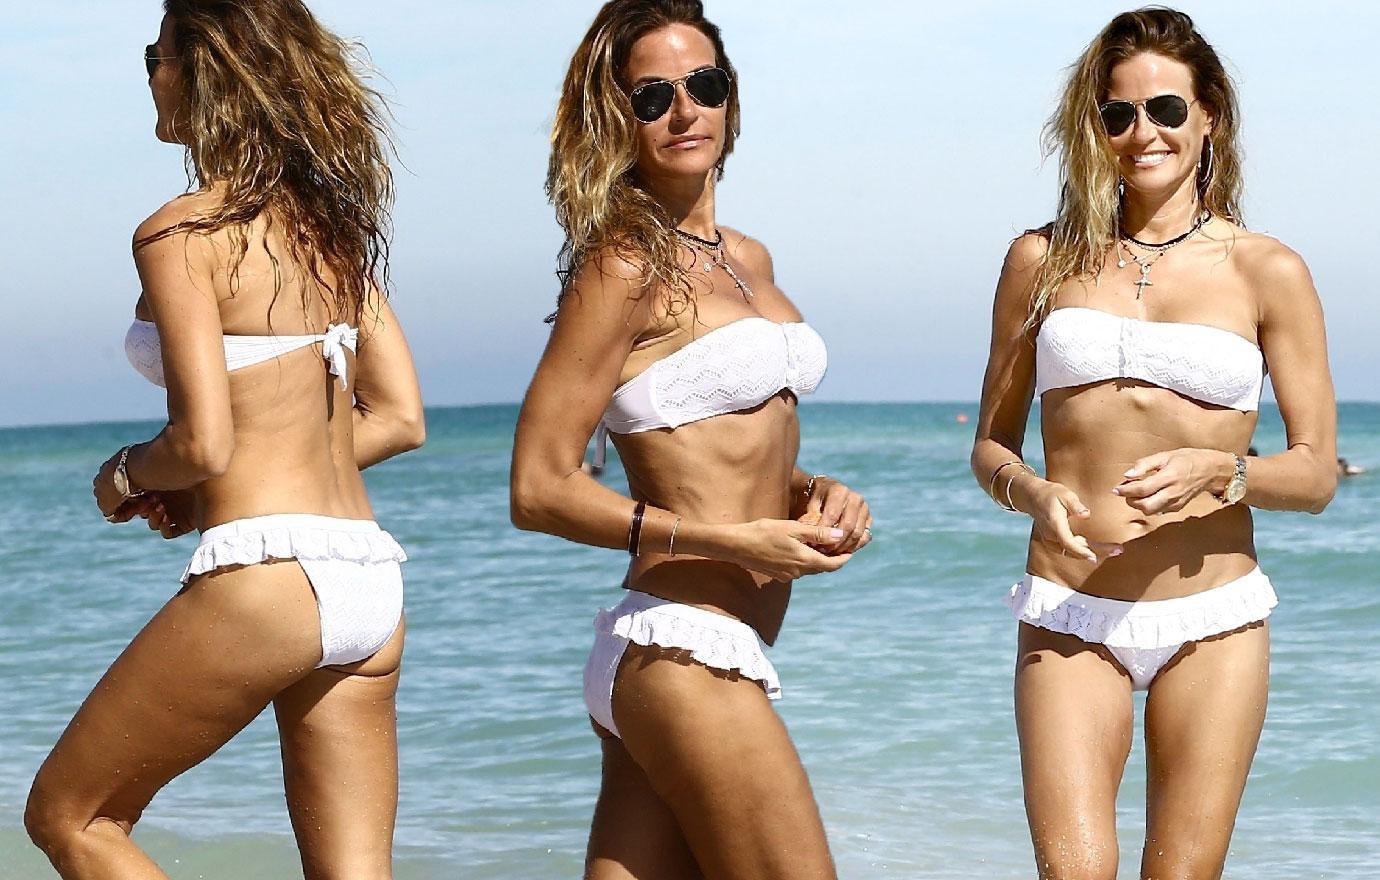 Kelly Bensimon Flaunts Amazing Beach Body